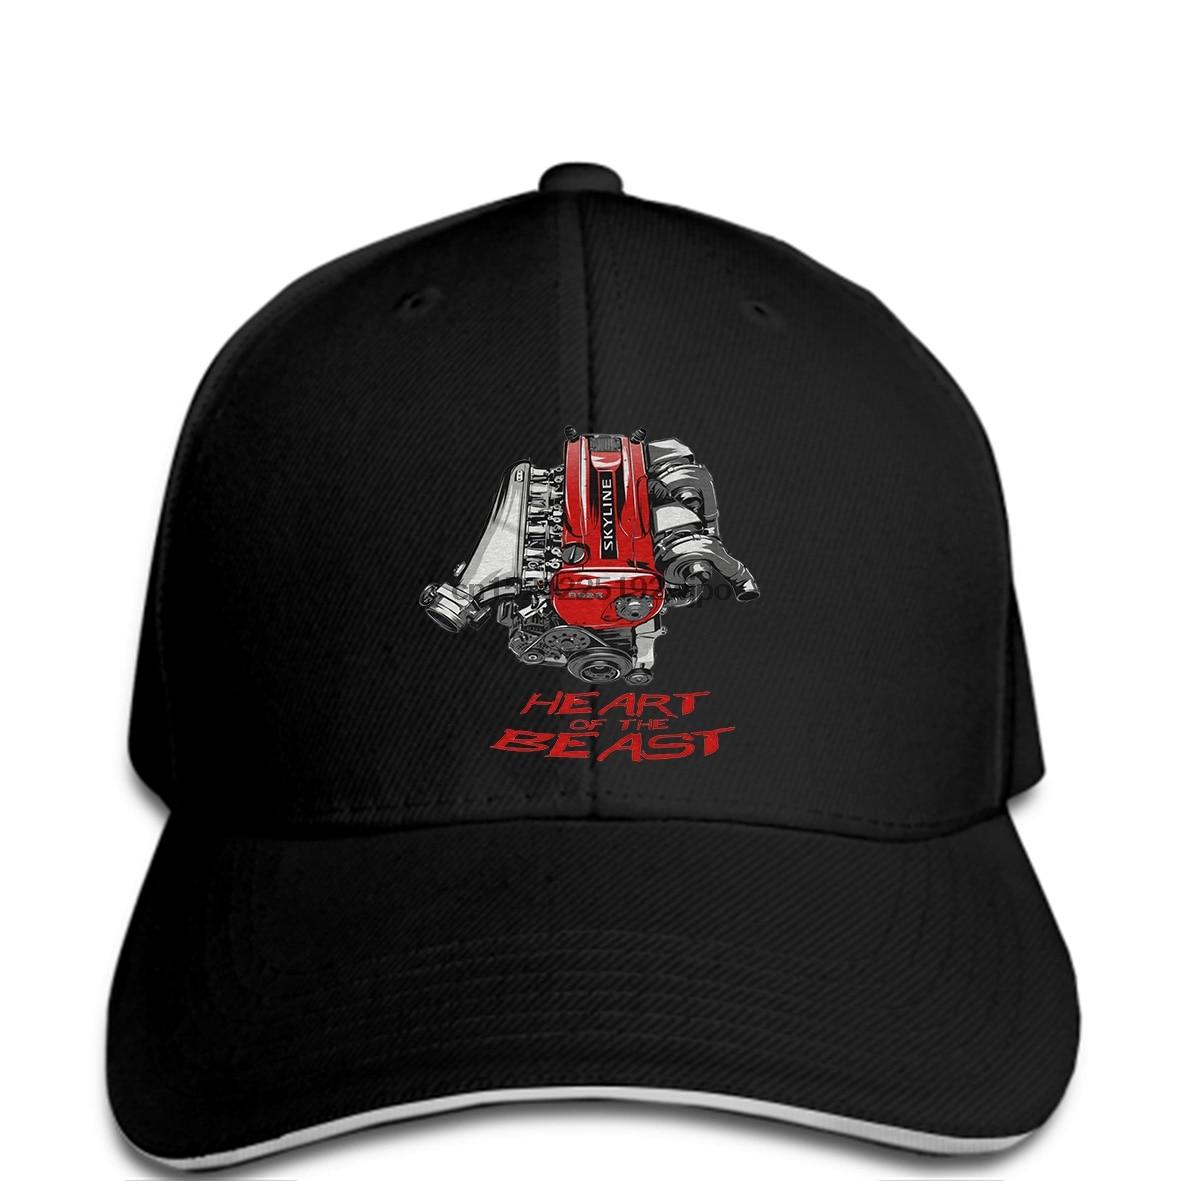 40410db1141 Men Baseball cap Fashion Nissan Skyline Gtr Rb26 R32 R33 R34 Heart of the  Beast Engine